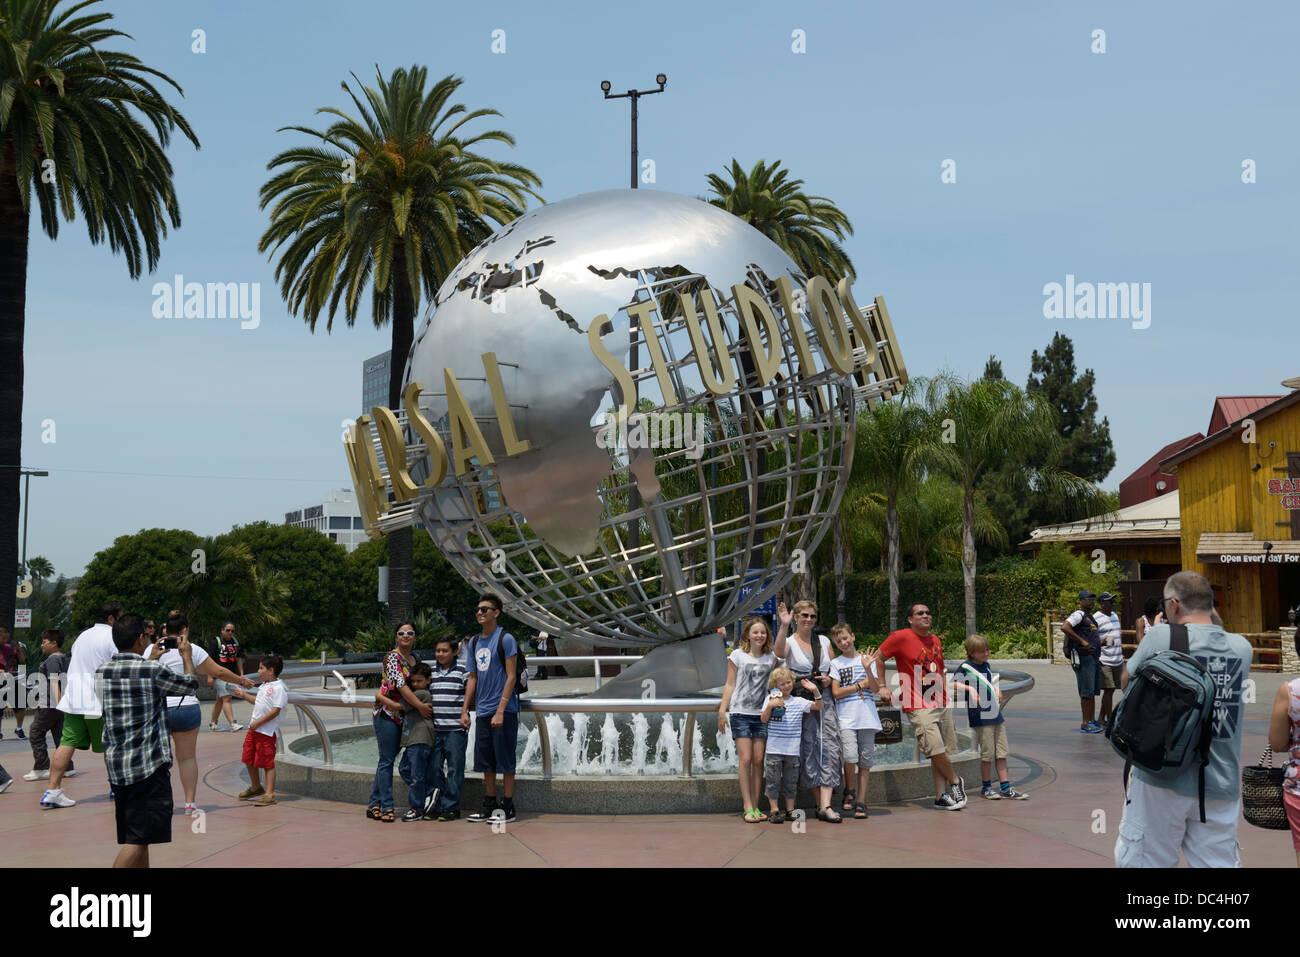 Universal Studios entrance, Hollywood, CA - Stock Image